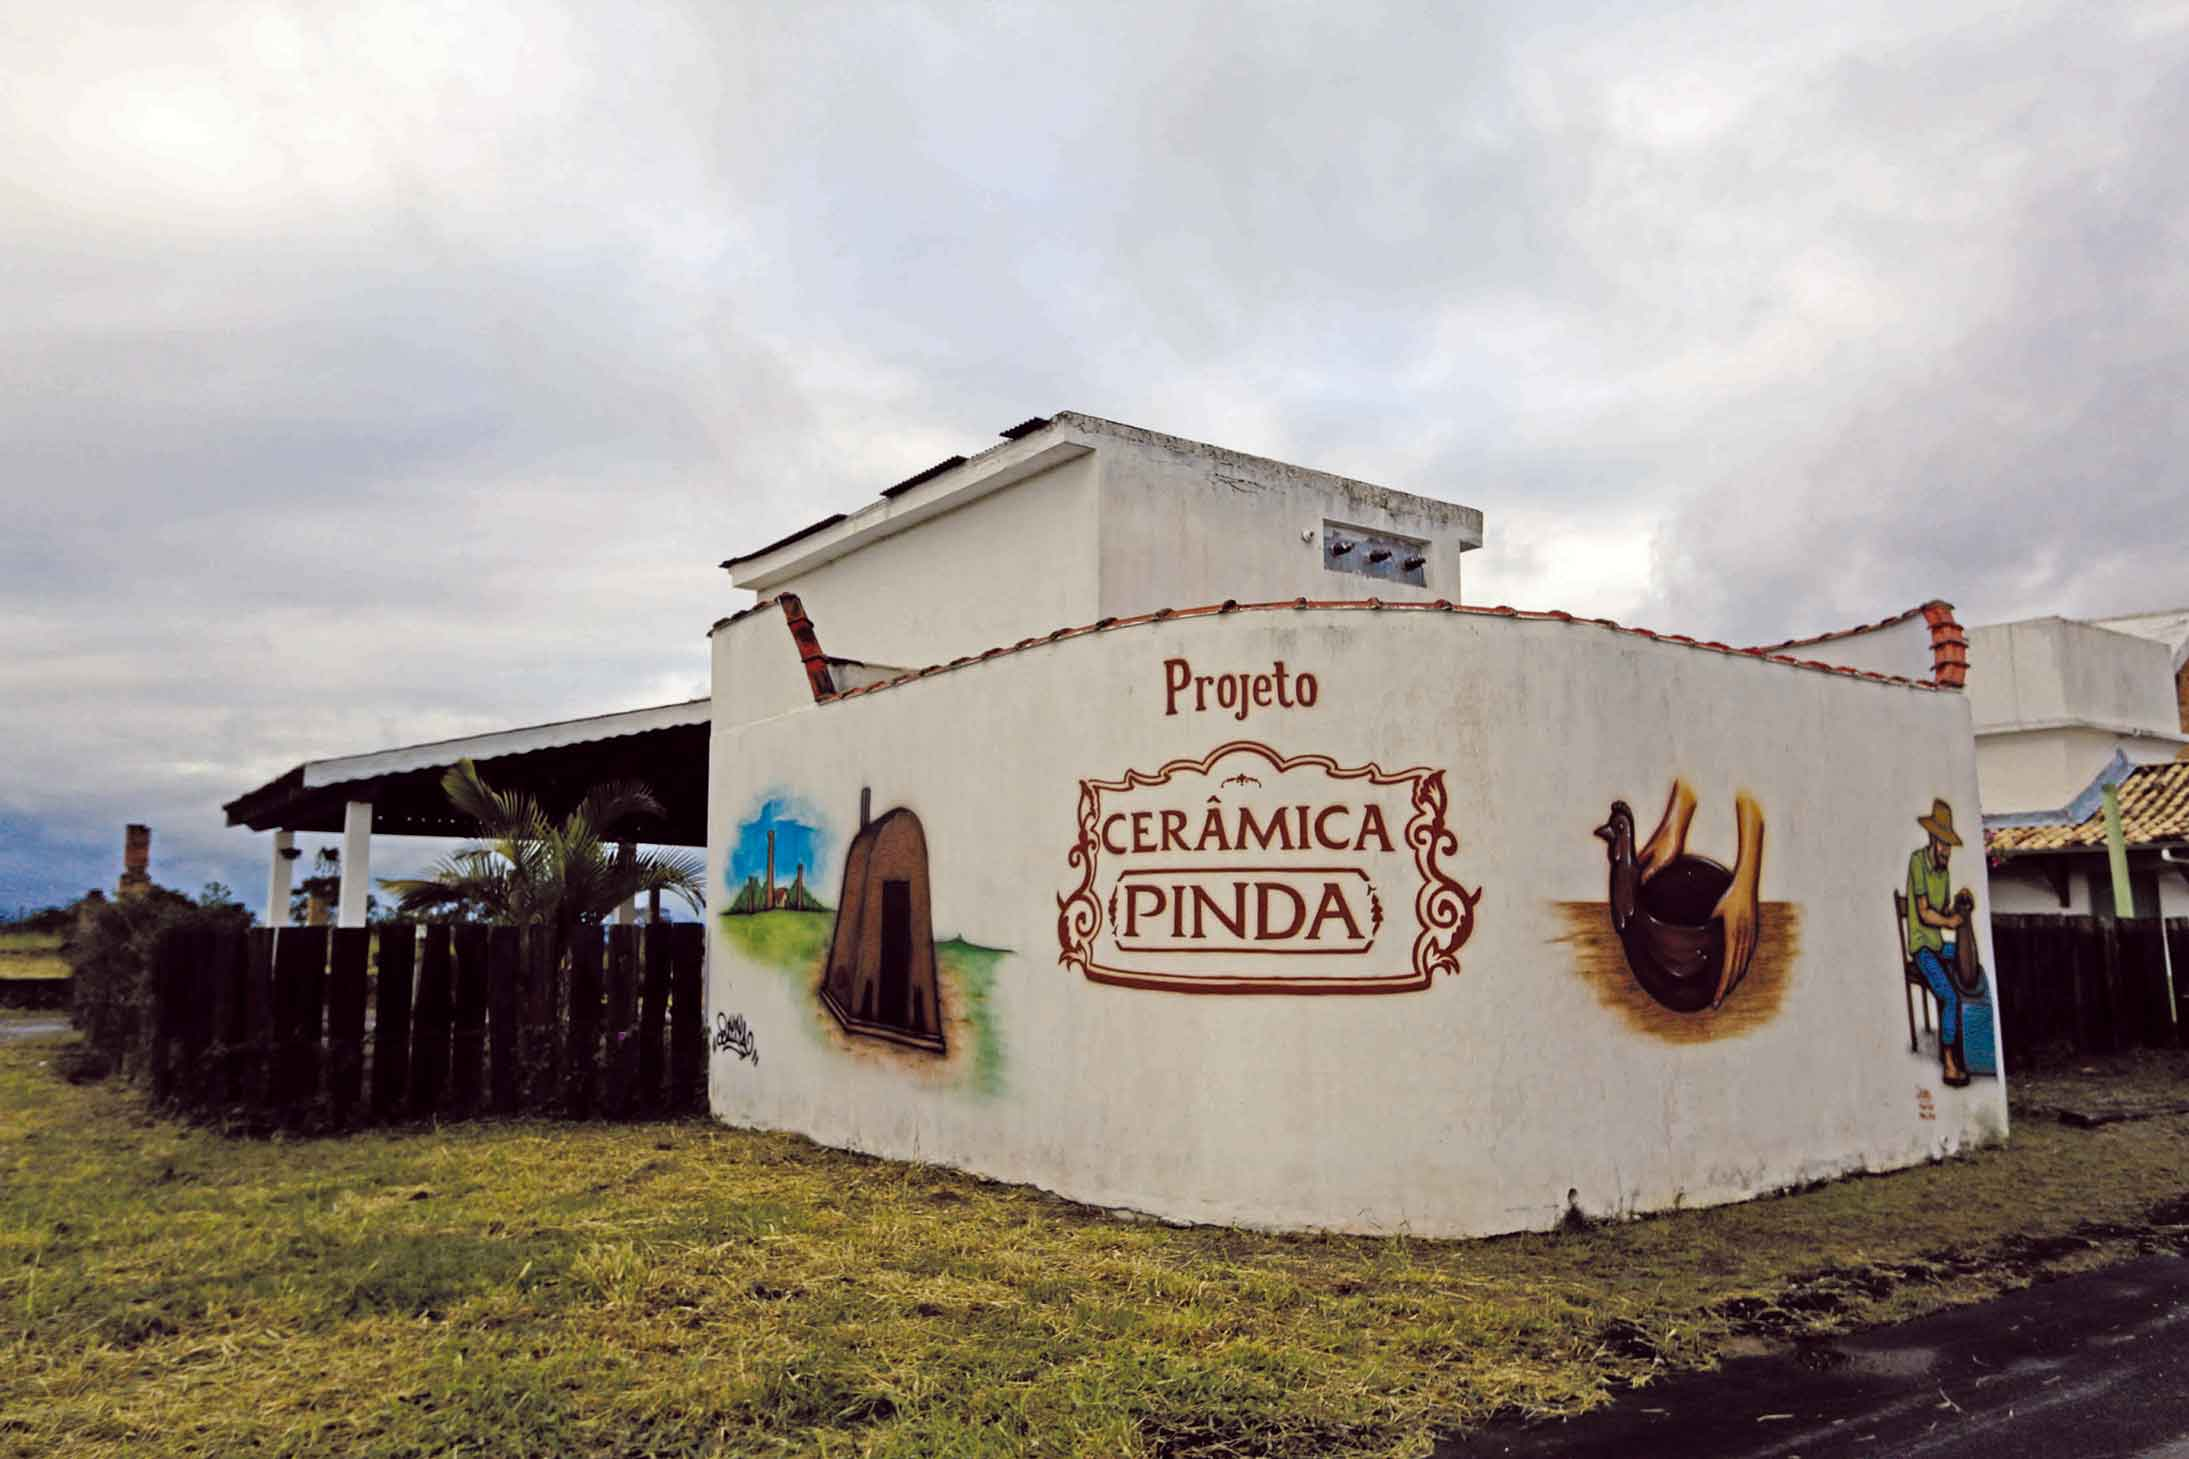 Projeto Cerâmica-Pindamonhangaba-Artes-Projeto-Ceramica-bx